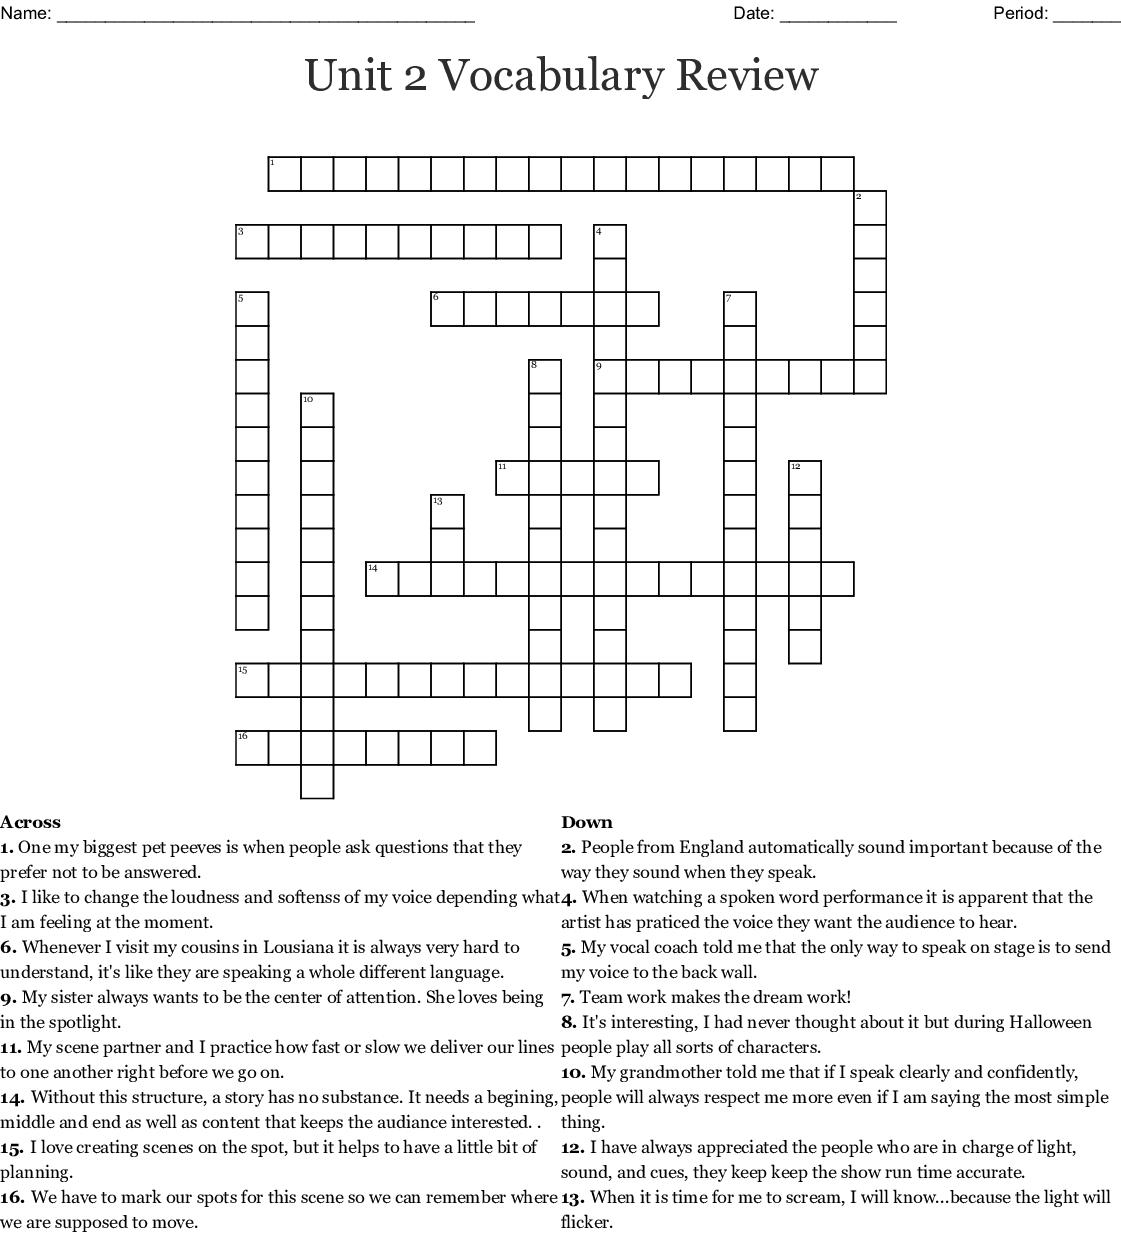 Unit 2 Vocabulary Review Crossword